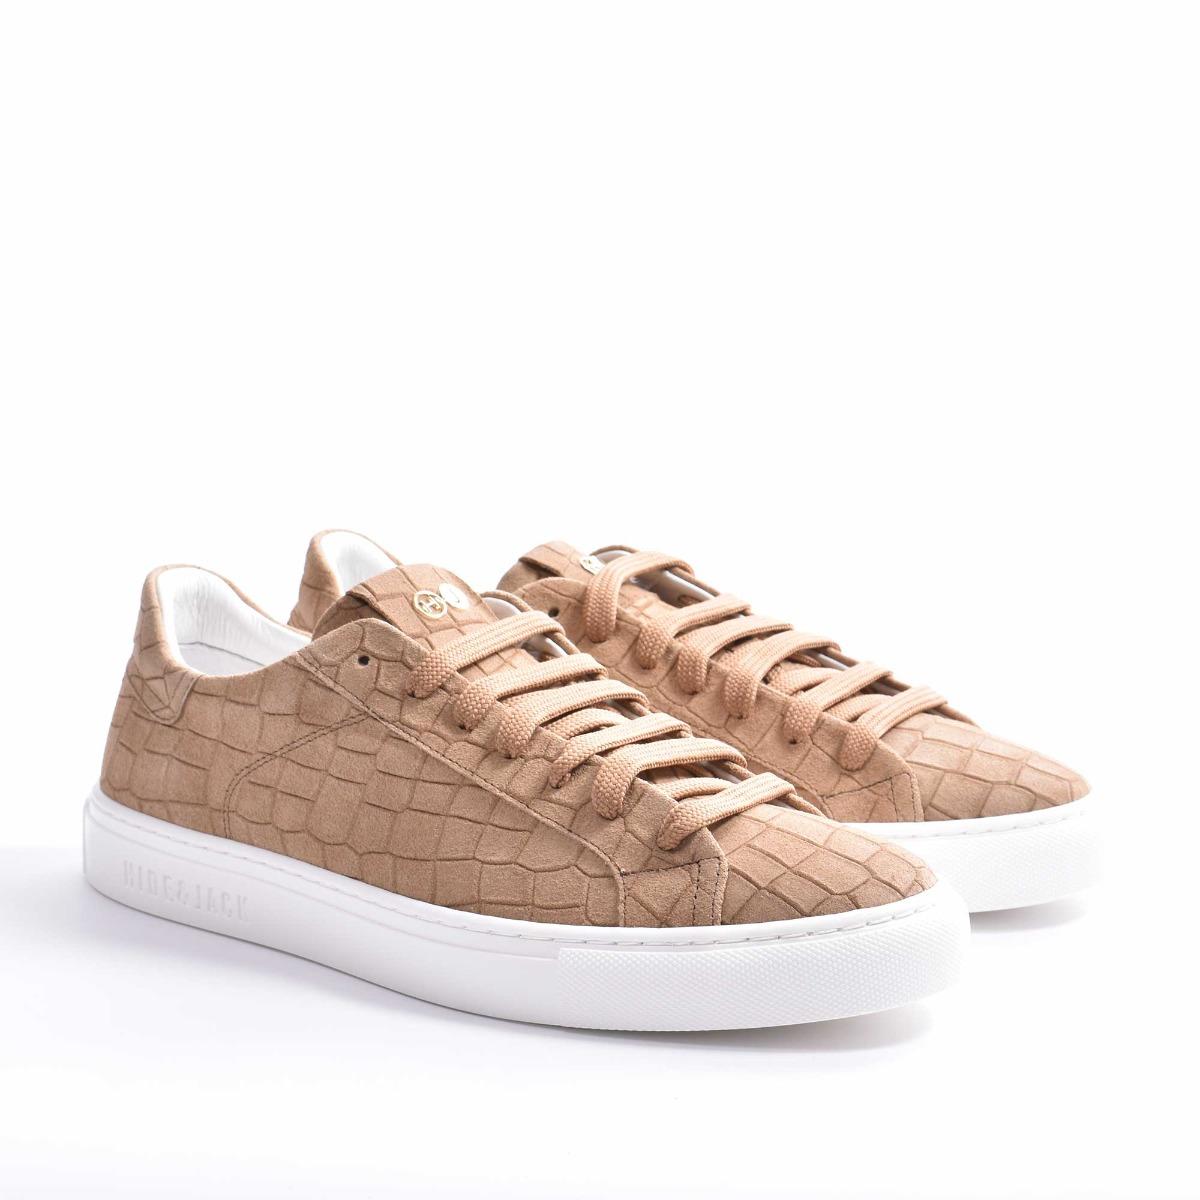 Sneakers essence croco suede - Cammello